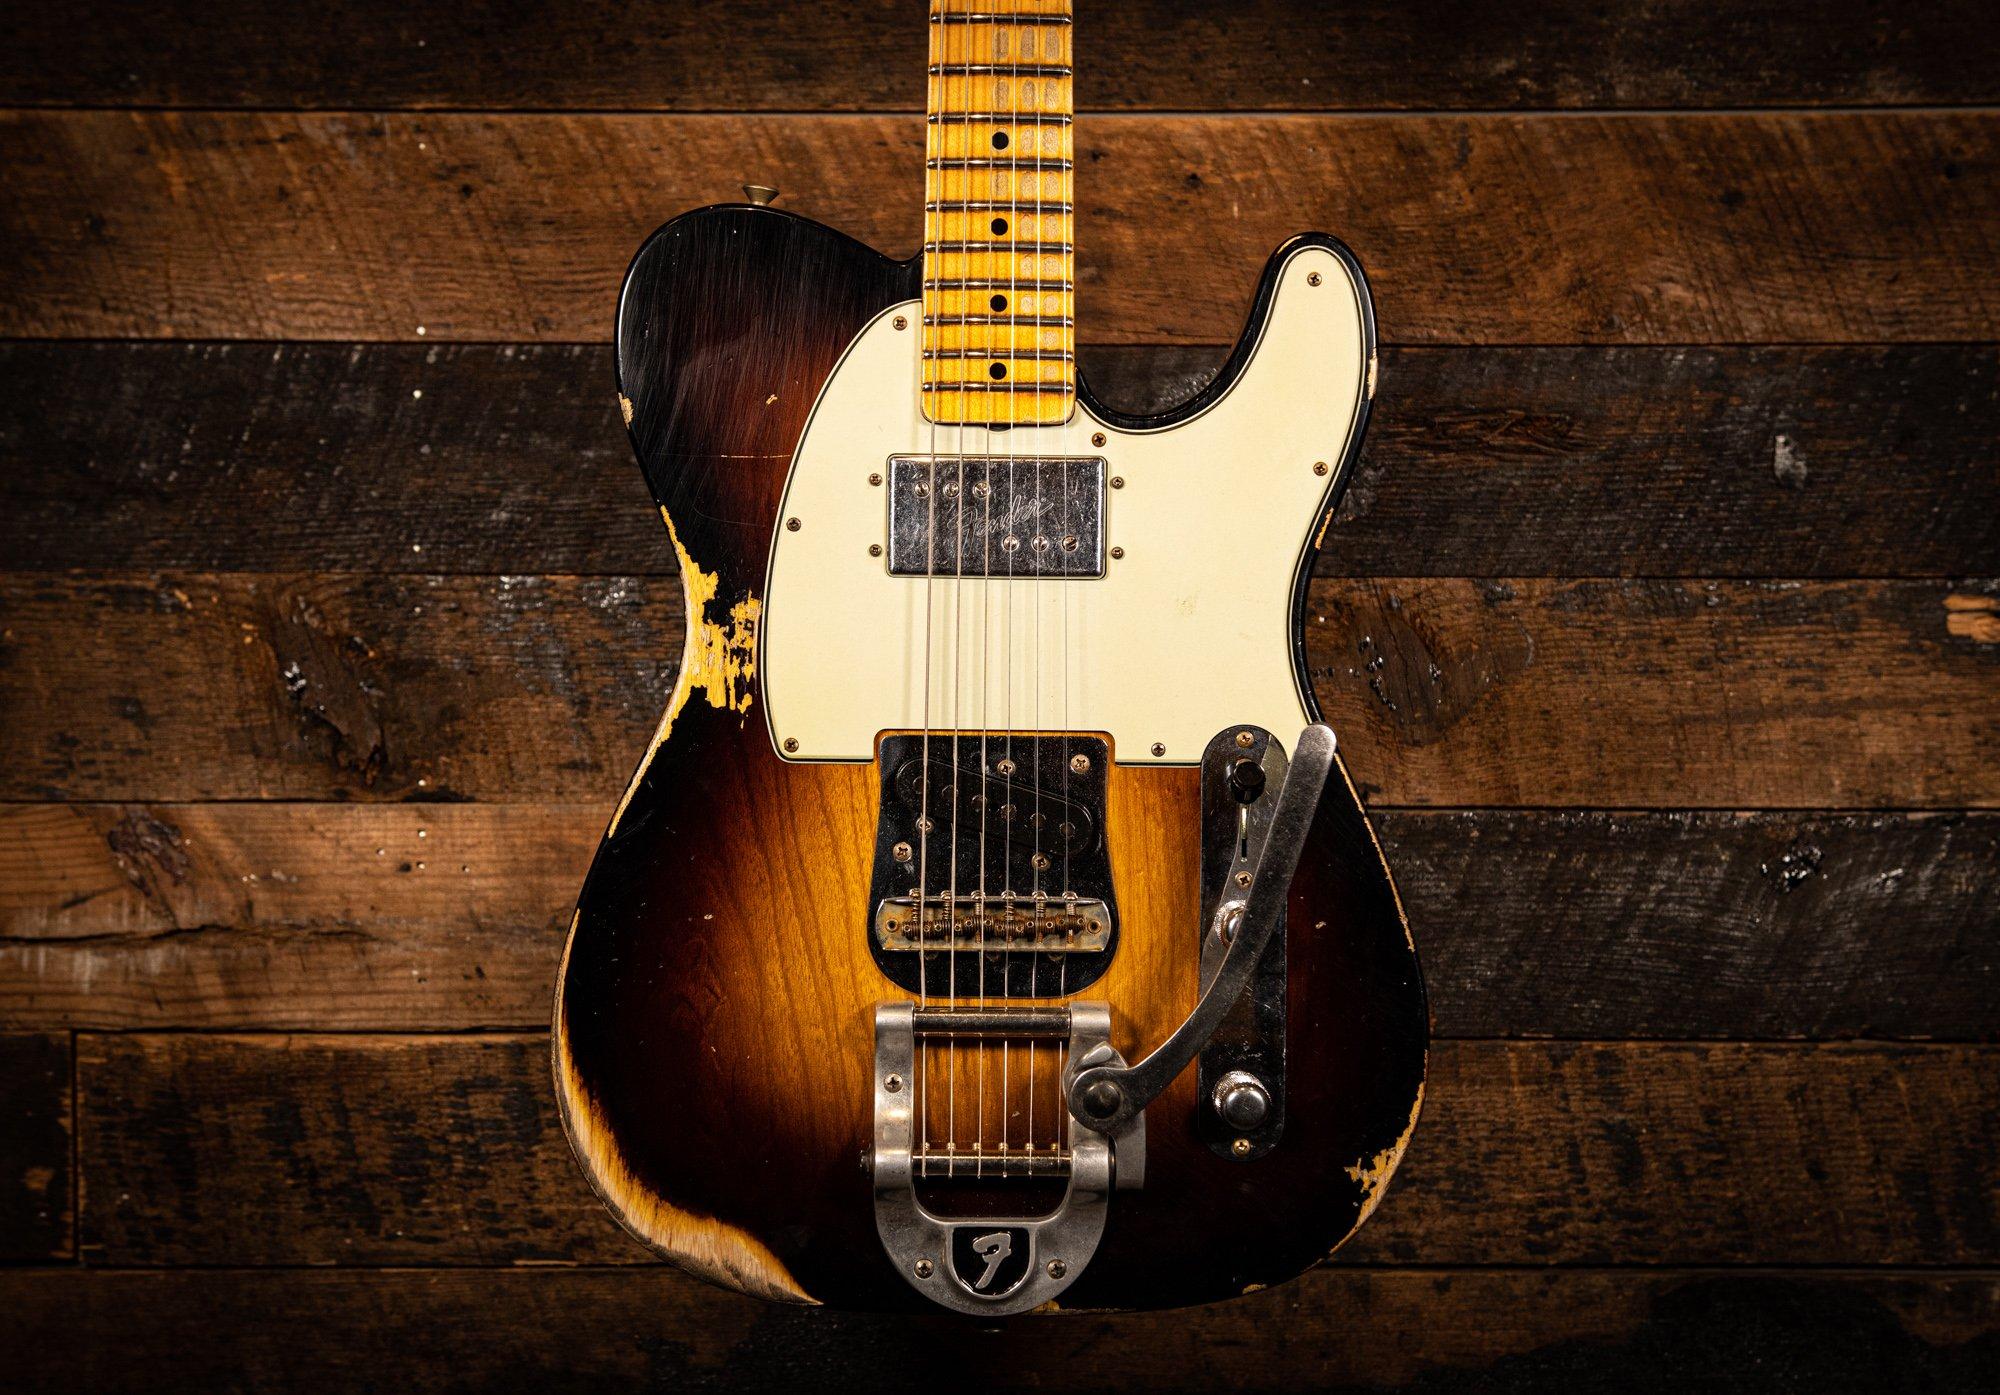 Fender Custom Shop LTD 1952 Telecaster CuNiFe Blackguard Heavy Relic in Wide-Fade 2-tone Sunburst